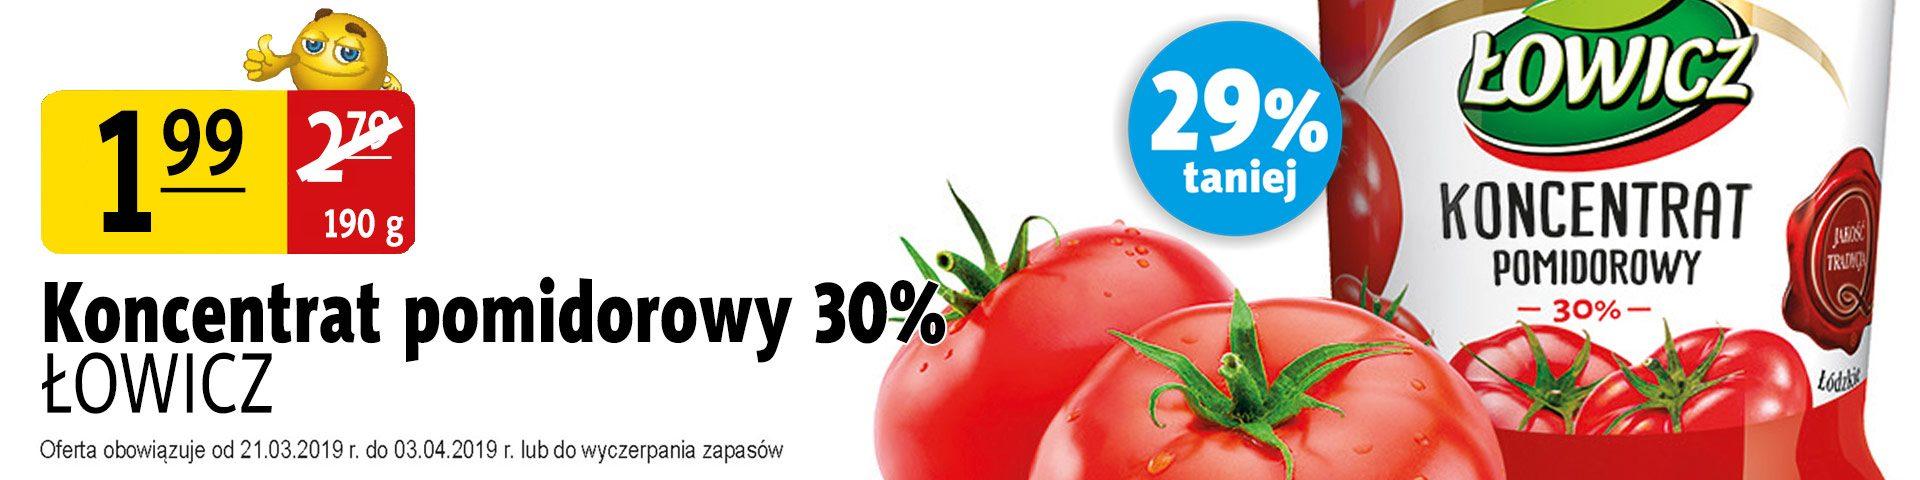 21.3-3.4.2019 koncentrat pomidorowy